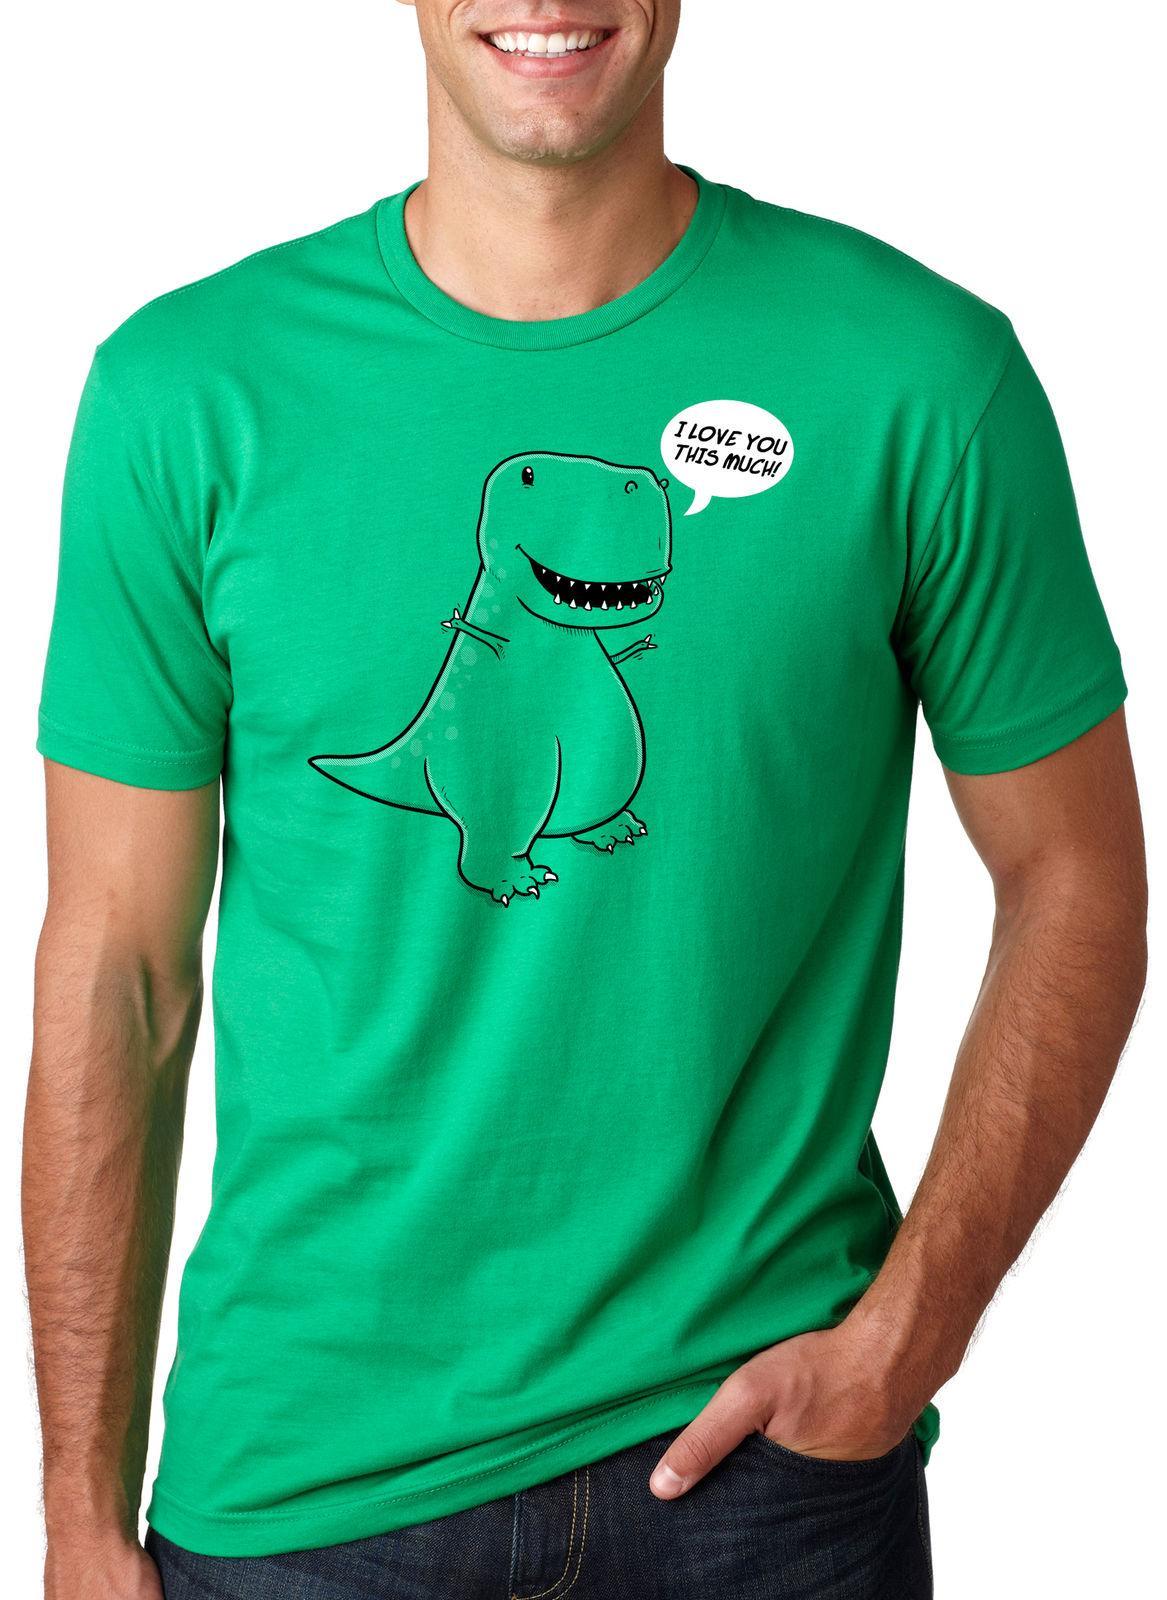 Divertenti Novità T-Shirt UOMO Tee T-Shirt-testato su Dinosauri